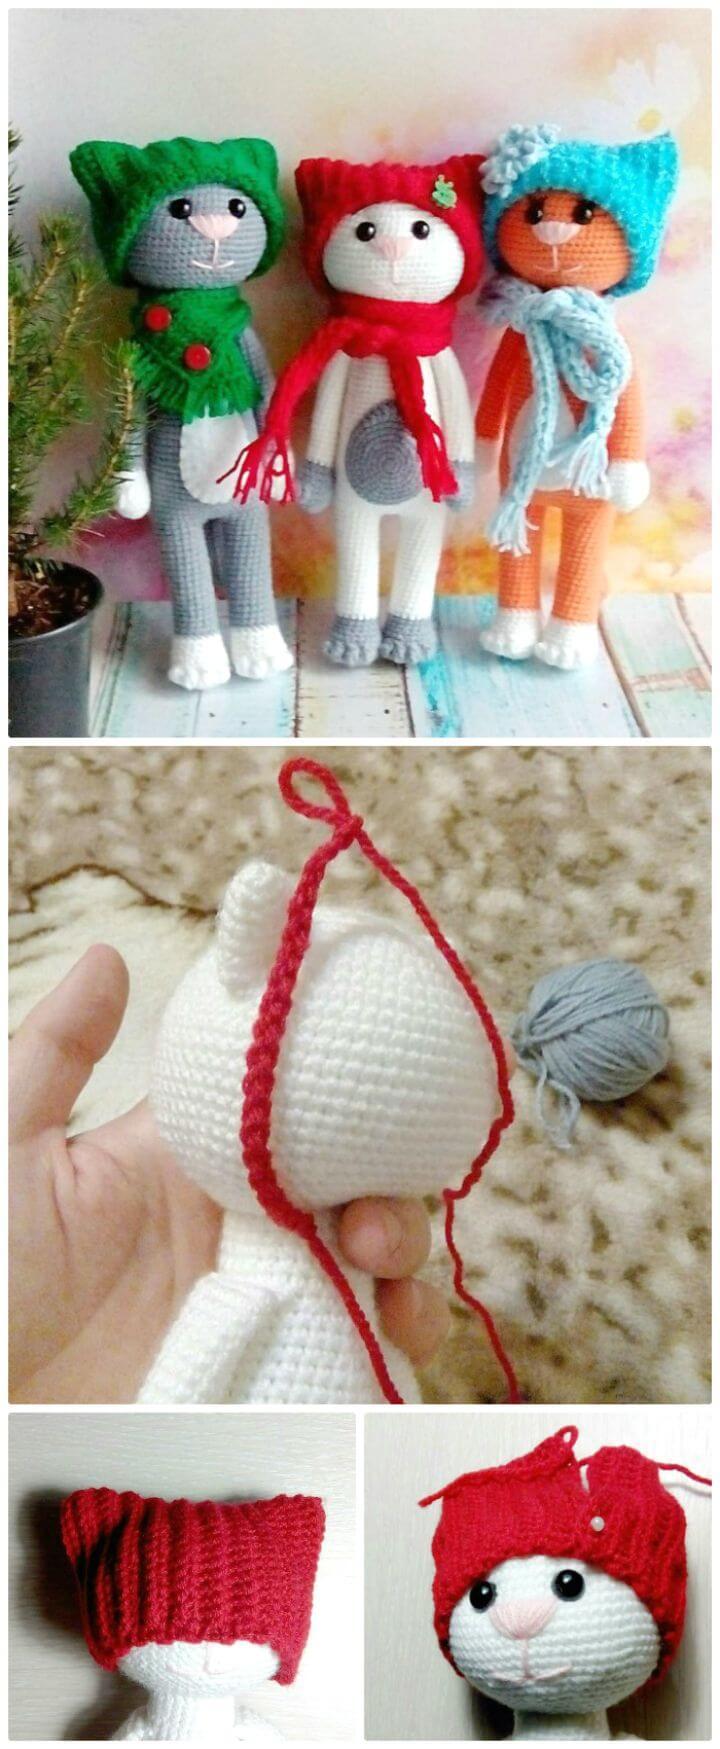 Easy Crochet Cat Patterns - Free Amigurumi Patterns • DIY & Crafts | 1749x720